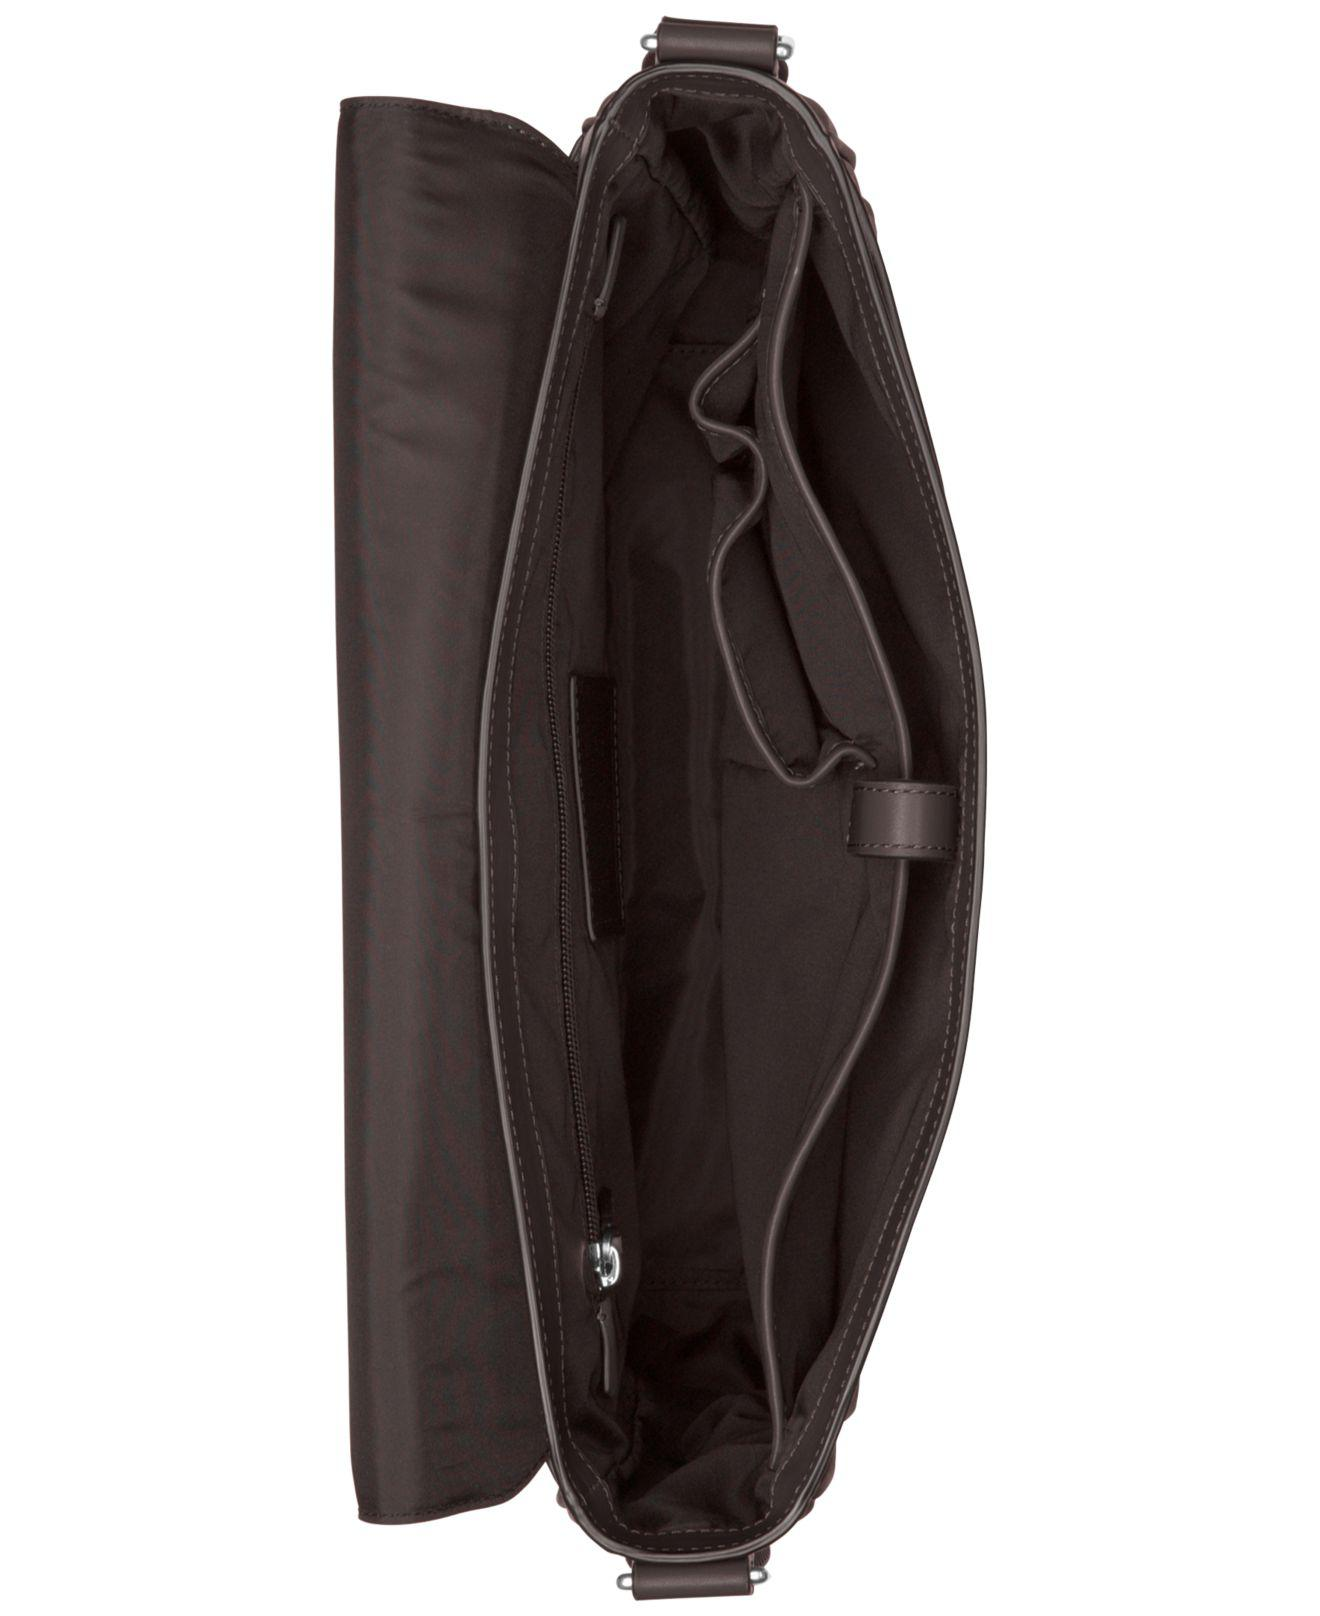 4a355493a4c0 Michael kors Men s Odin Resina Large Messenger Bag in Brown for Men ...